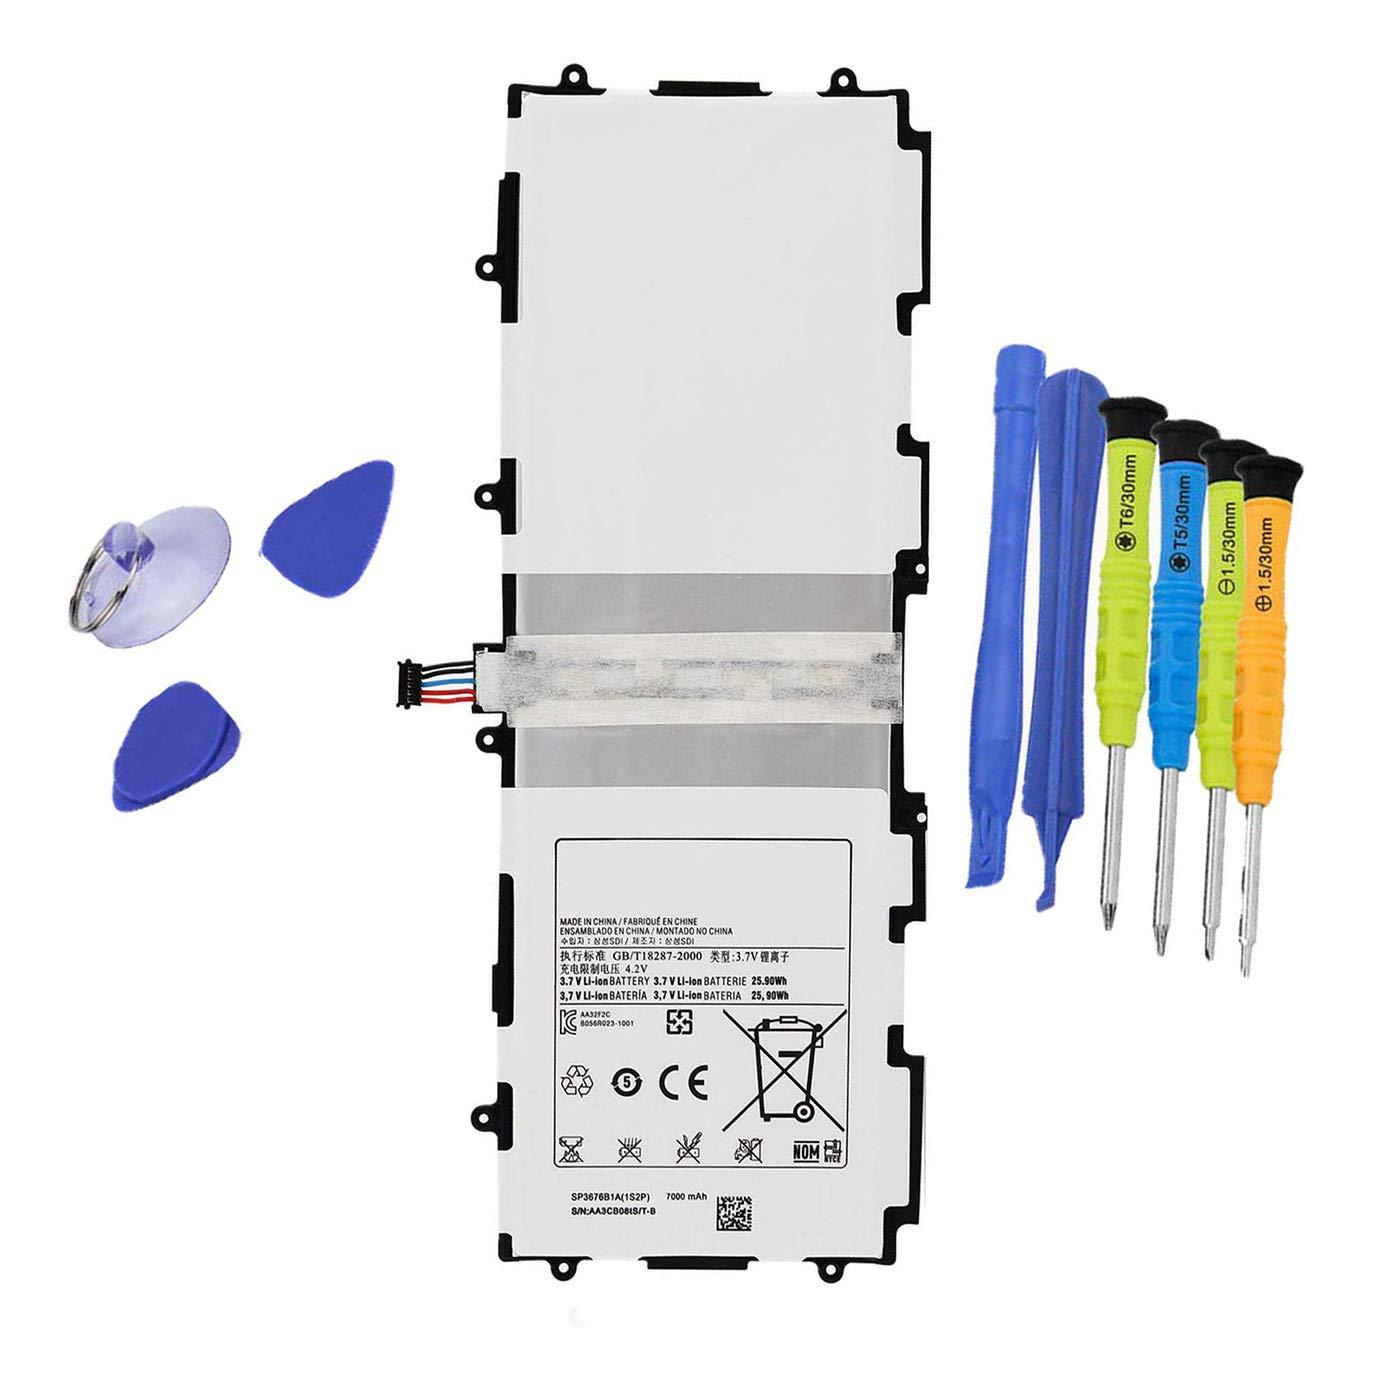 Bateria Dentsing 3.7v 25.9wh/7000mah Sp3676b1a 1s2p Tablet Para Samsung Galaxy Tab 10.1 Gt-p7500 P7510 Tab 2 10.1 Gt-p51